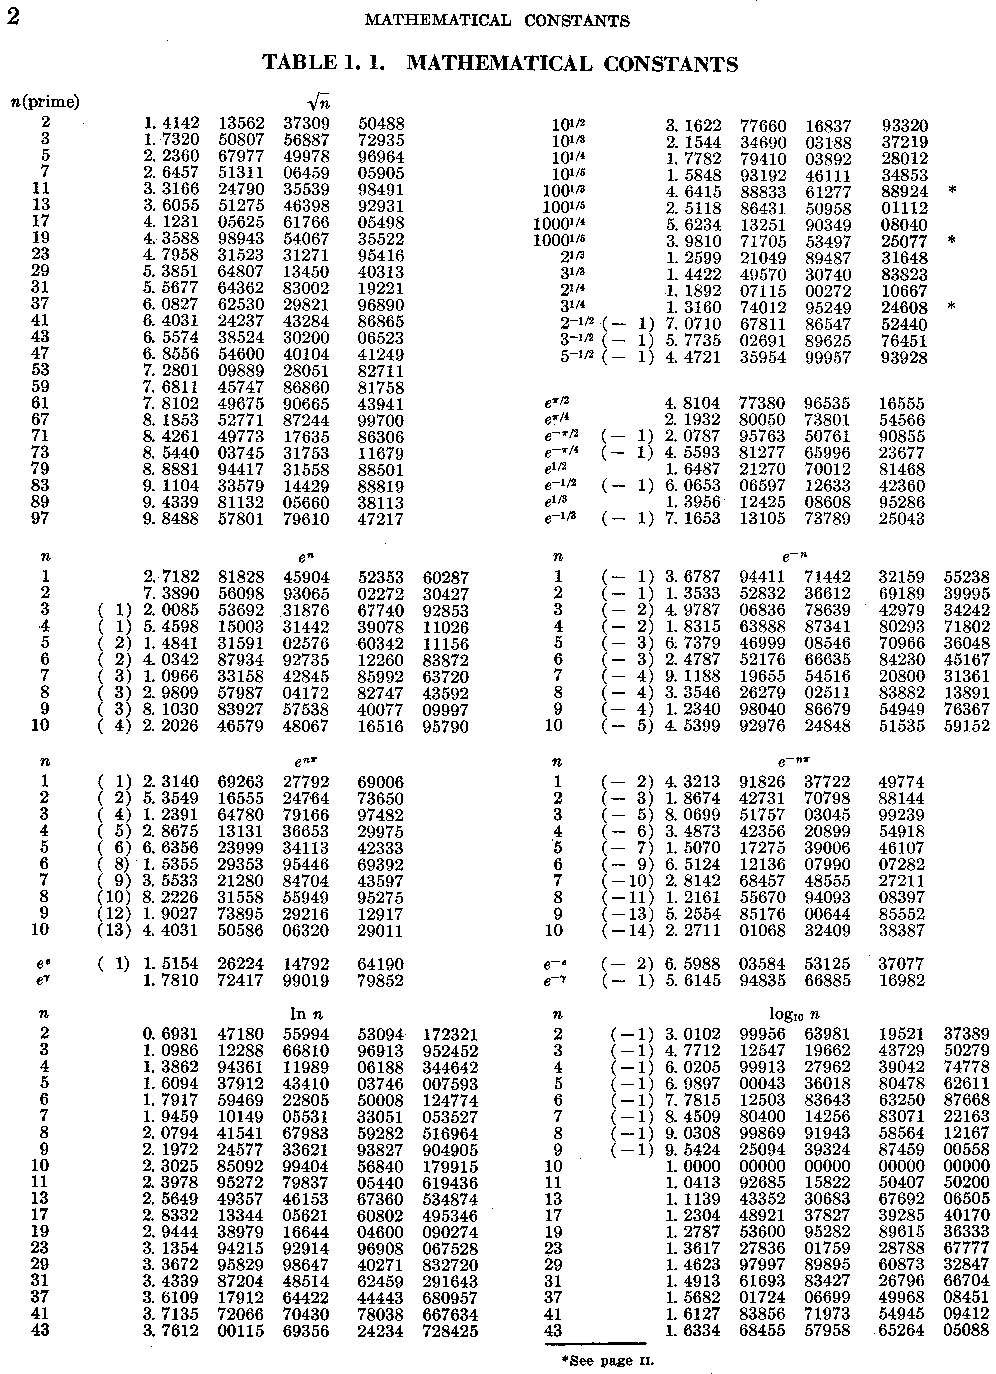 Handbook of Mathematical Functions, p. 2